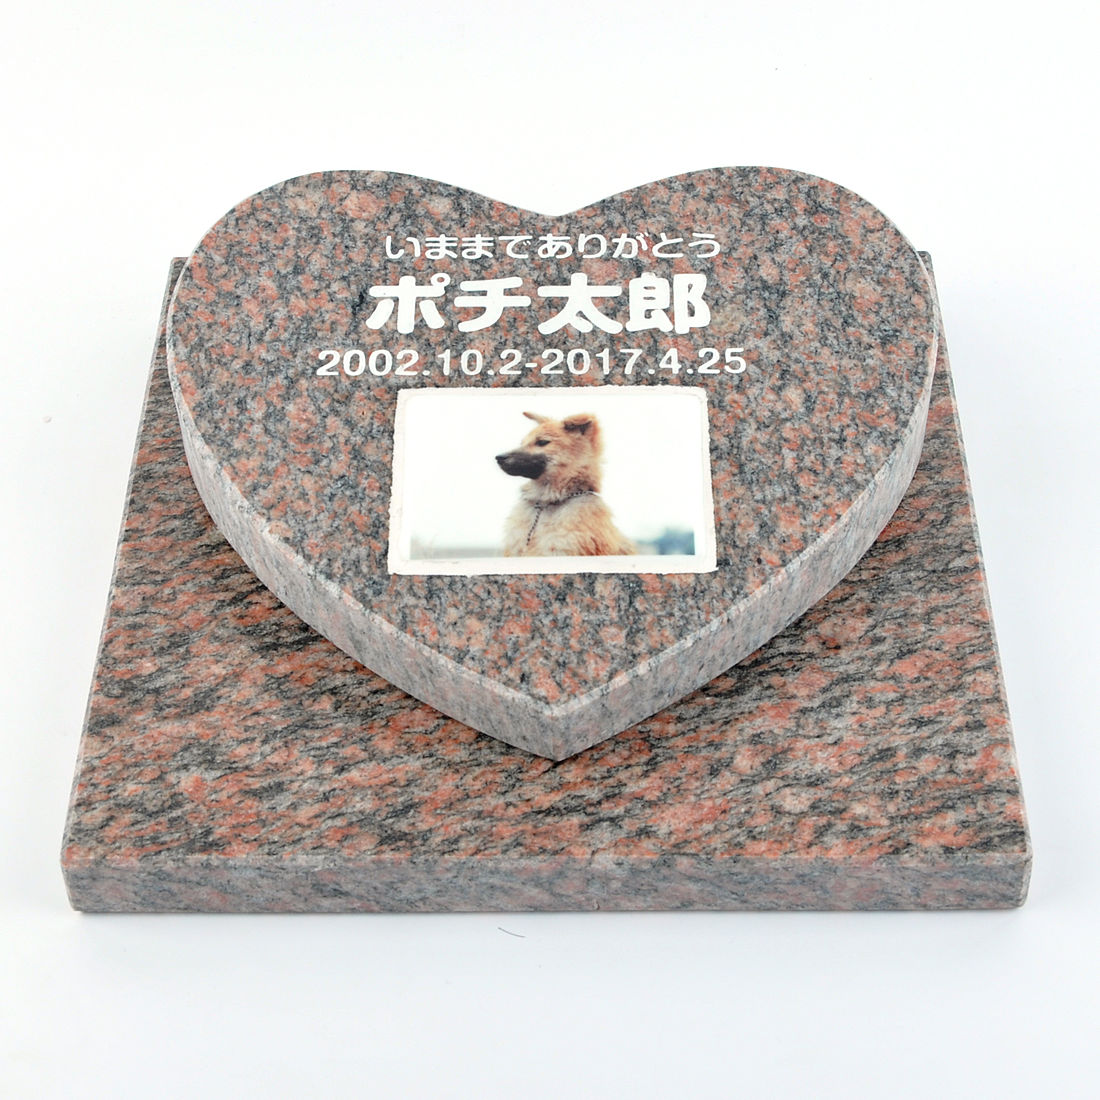 Pet&Love. ペットのお墓 天然石製 セット型 遺影付きタイプ 御影石 レッド ハート(お客様の写真を印刷)  【HLS_DU】【楽ギフ_名入れ】 attr169attr ctgr2ctgr sml3sml+ctgr2ctgr noanml